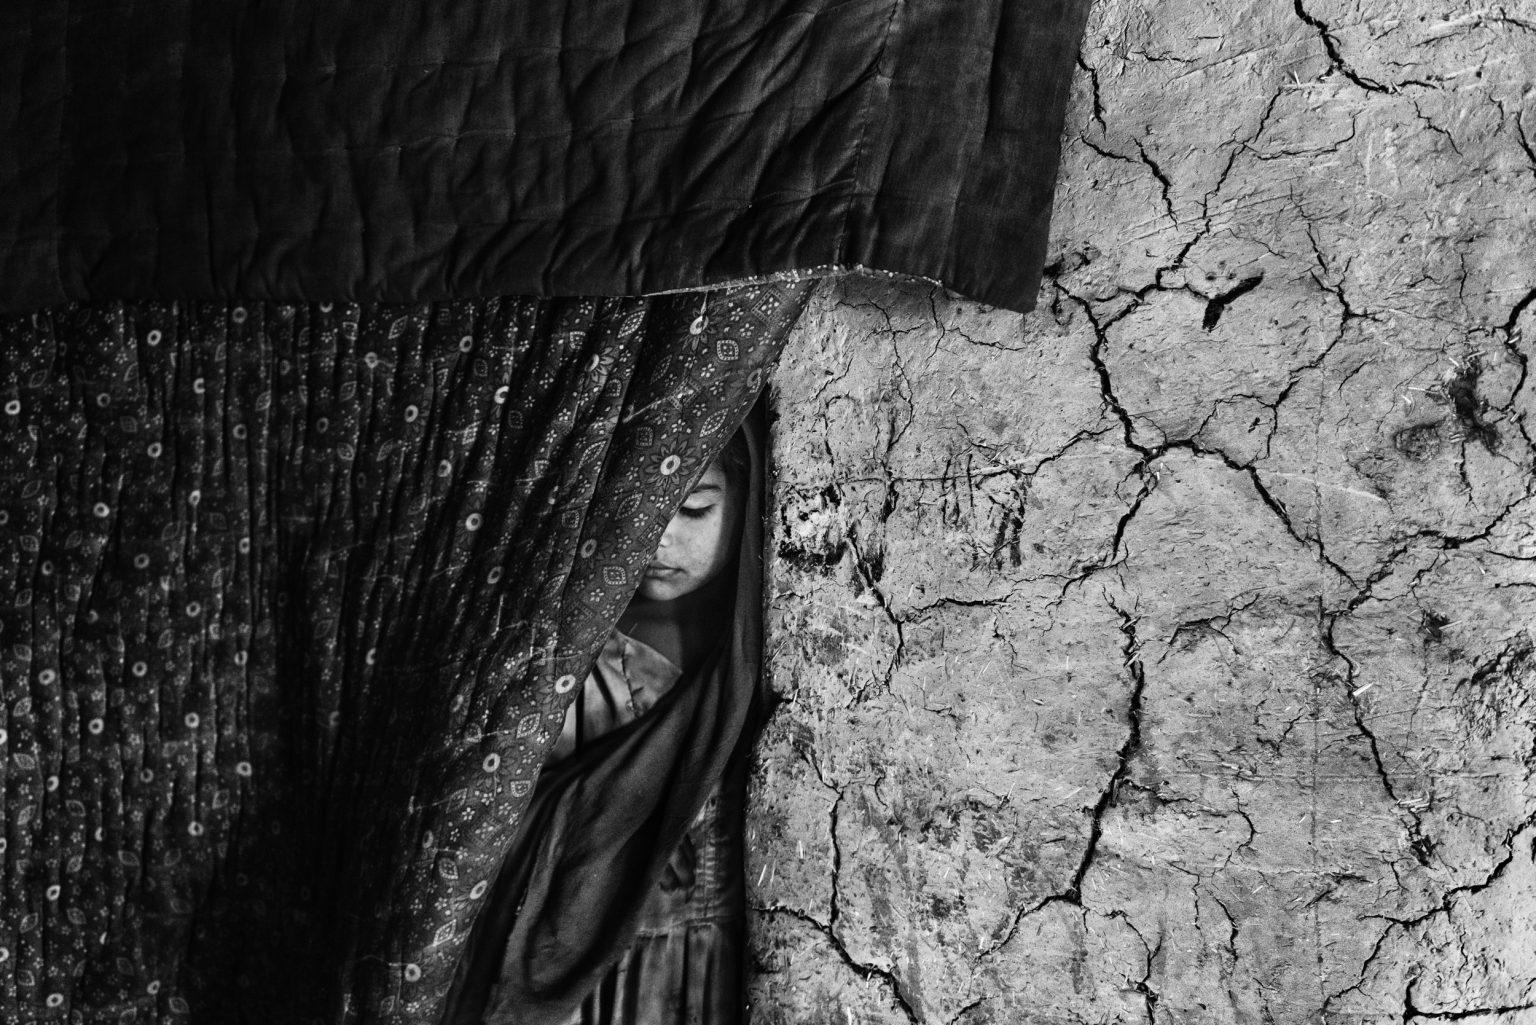 Kabul, Afghanistan, March 2019 - A girl stands at the entrance of her family mud house in Hussain Khail informal settlement, in the outskirts of Kabul. Her uncle and brother were killed in an airstrike that struck the compound were the family lived in the village of Chardara, in the northern province of Kunduz. Survivors were stuck in the crossfire between the Taliban and the Afghan Army for an entire day before they could leave the area. During a break in the fightings  they were evacuated directly to Kabul. Almost two-thirds of the Afghan population lives in areas directly affected by conflict; Aaccording to UNHCR data 340 thousand people were forced to flee from their homes in 2018 setting the total of internal displaced people to a record number of almost 2 million. >< Kabul, Afghanistan, marzo 2019 -  Una bambina all'entrata della casa di fango in cui abita con la famiglia nell'insediamento di Hussain Khail, alla periferia di Kabul. Suo zio e suo fratello sono stati uccisi in un attacco aereo che ha colpito la casa dove viveva con la famiglia nel villaggio di Chardara, nella provincia settentrionale di Kunduz. I sopravvissuti sono rimasti bloccati dai combattimenti a fuoco tra i talebani e l'esercito afghano per un giorno intero prima che potessero lasciare l'area. Durante una pausa dai combattimenti sono stati evacuati direttamente a Kabul.  Quasi due terzi della popolazione afgana vive in aree direttamente colpite dal conflitto; secondo i dati dell'UNHCR, 340mila persone sono state costrette a fuggire dalle proprie case nel 2018, portando il totale degli sfollati interni a un numero record di quasi 2 milioni.